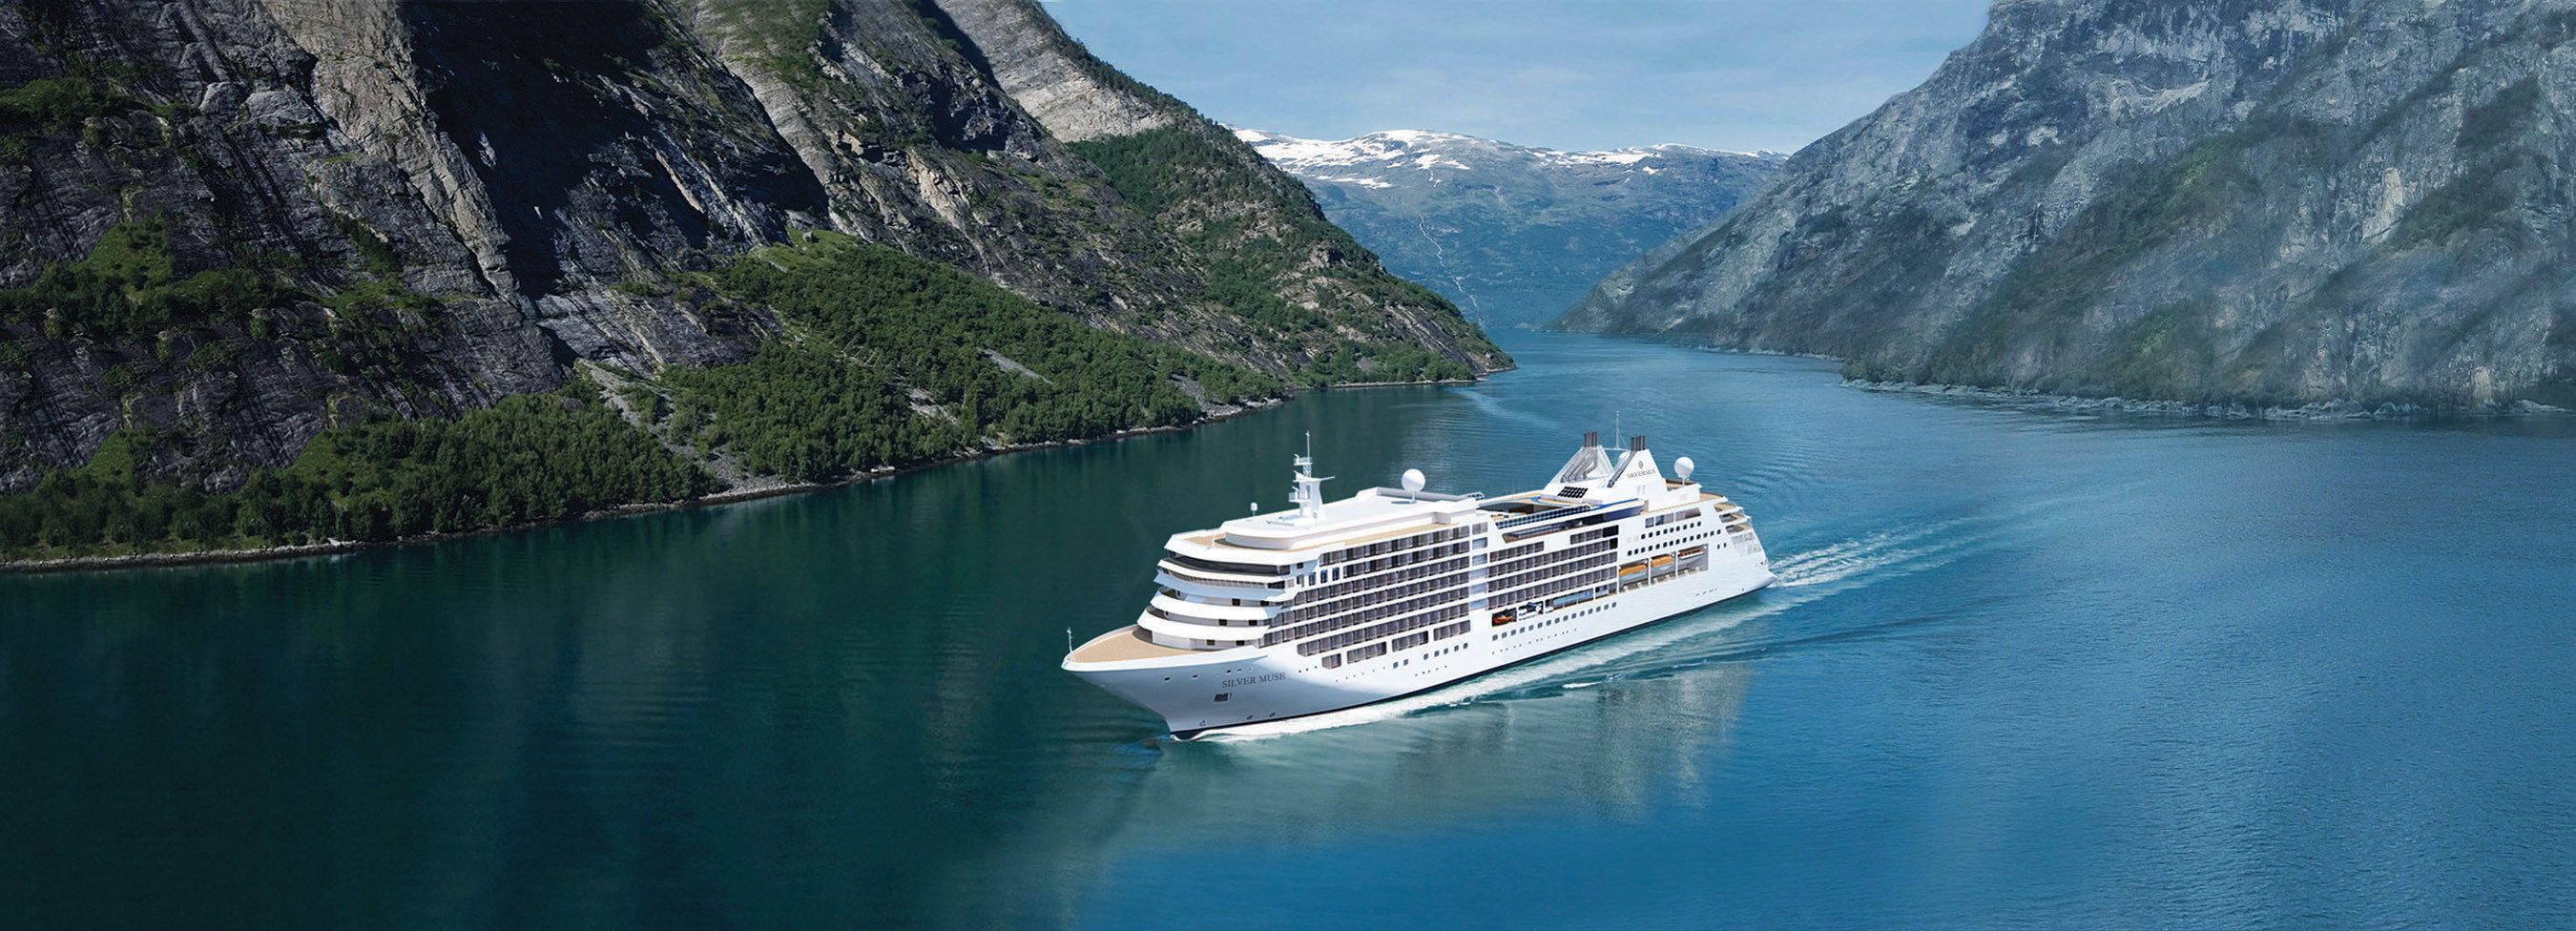 Silversea Cruises' Silver Muse